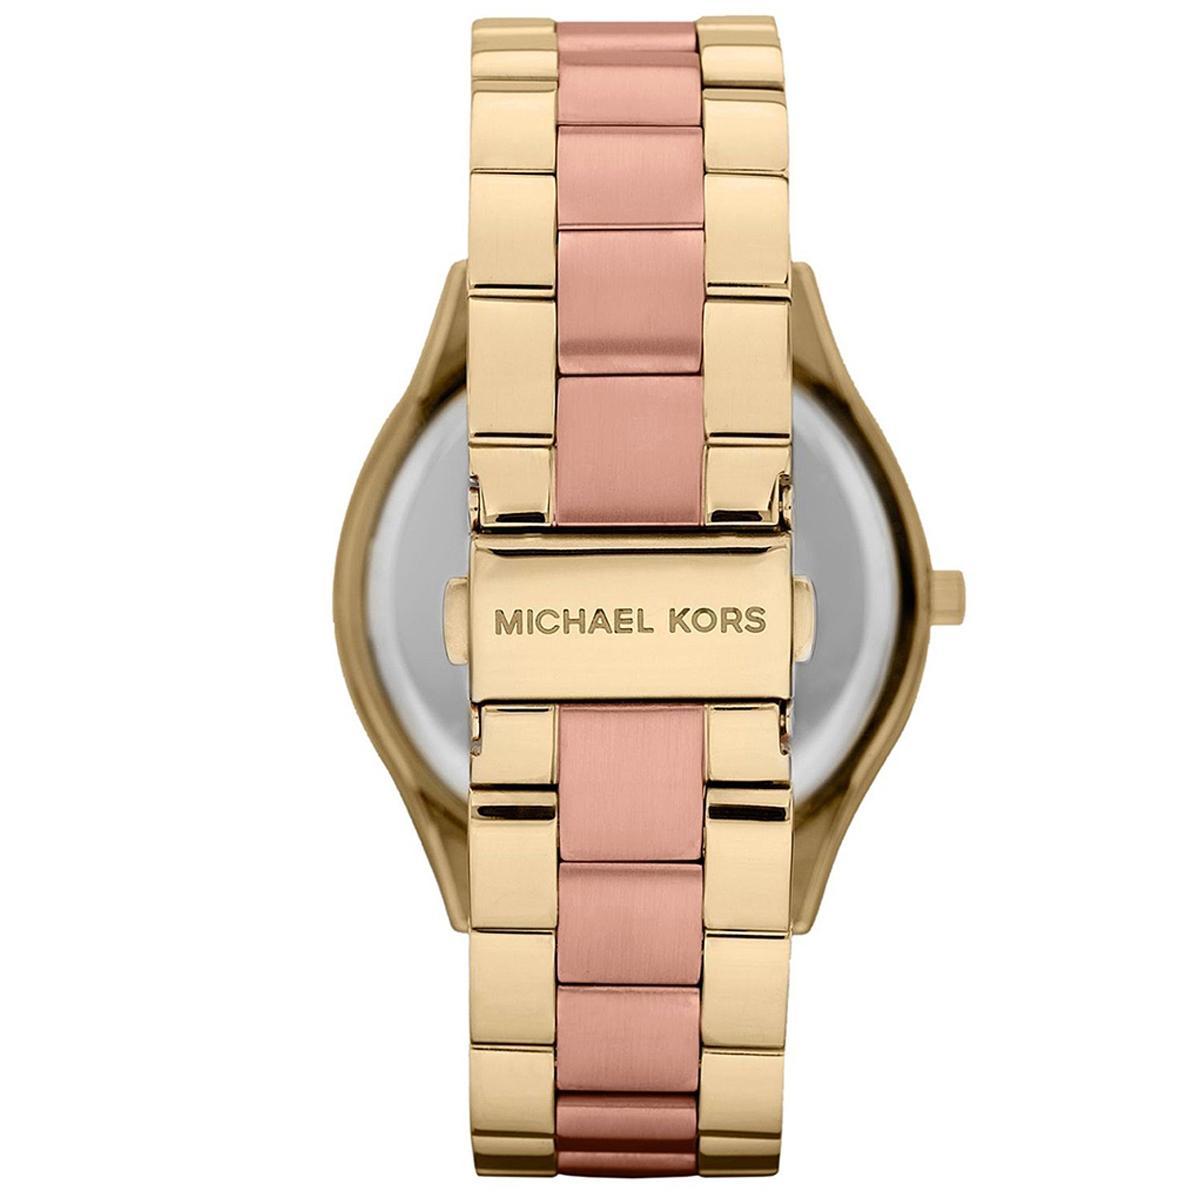 9f3e3ef5a97 Relogio feminino michael kors bicolor mk3493 - Relógio Feminino ...